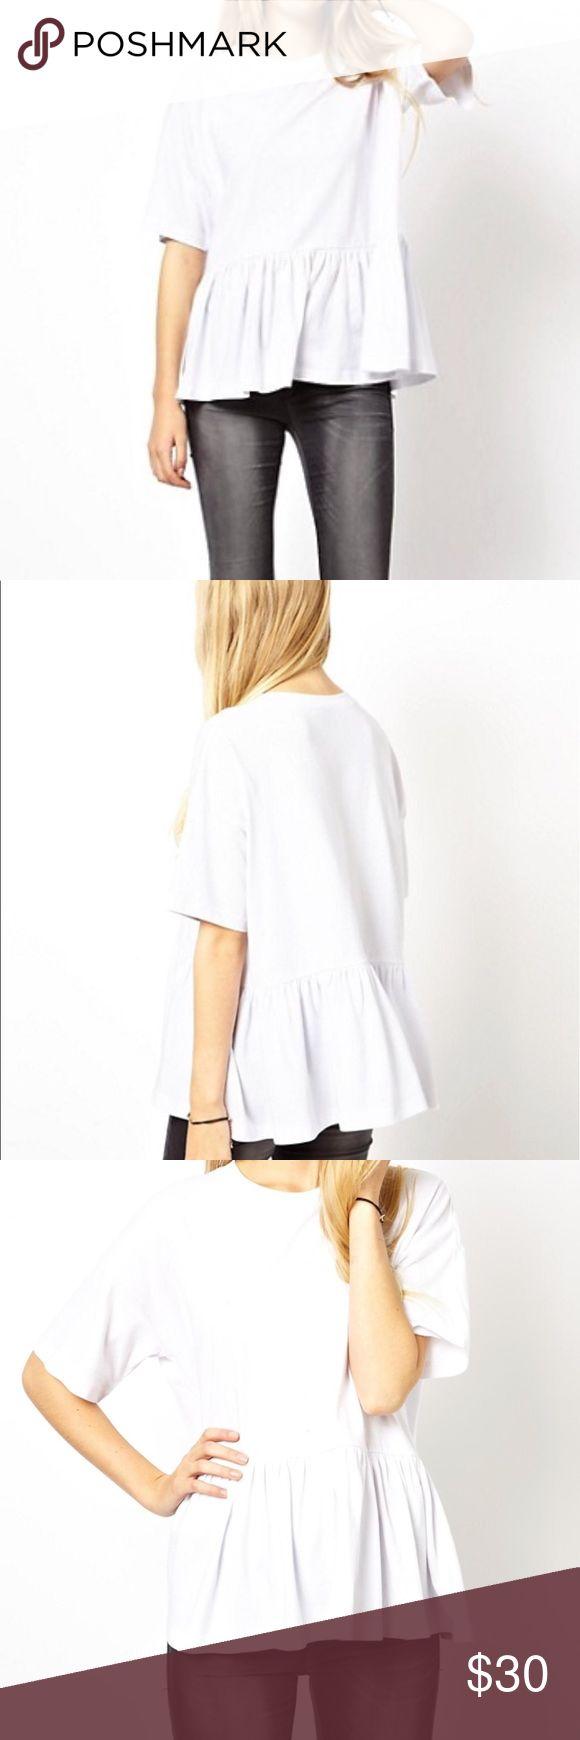 "ASOS 14 Plus Size Oversized Smock T-Shirt US 14 ASOS 14 Plus Size Oversized Smock T-Shirt US 14. Perfect condition. Never worn. Measures approx 25.5"" long  7"" sleeve  28"" bust  26.5"" waist  laying flat Asos Tops"